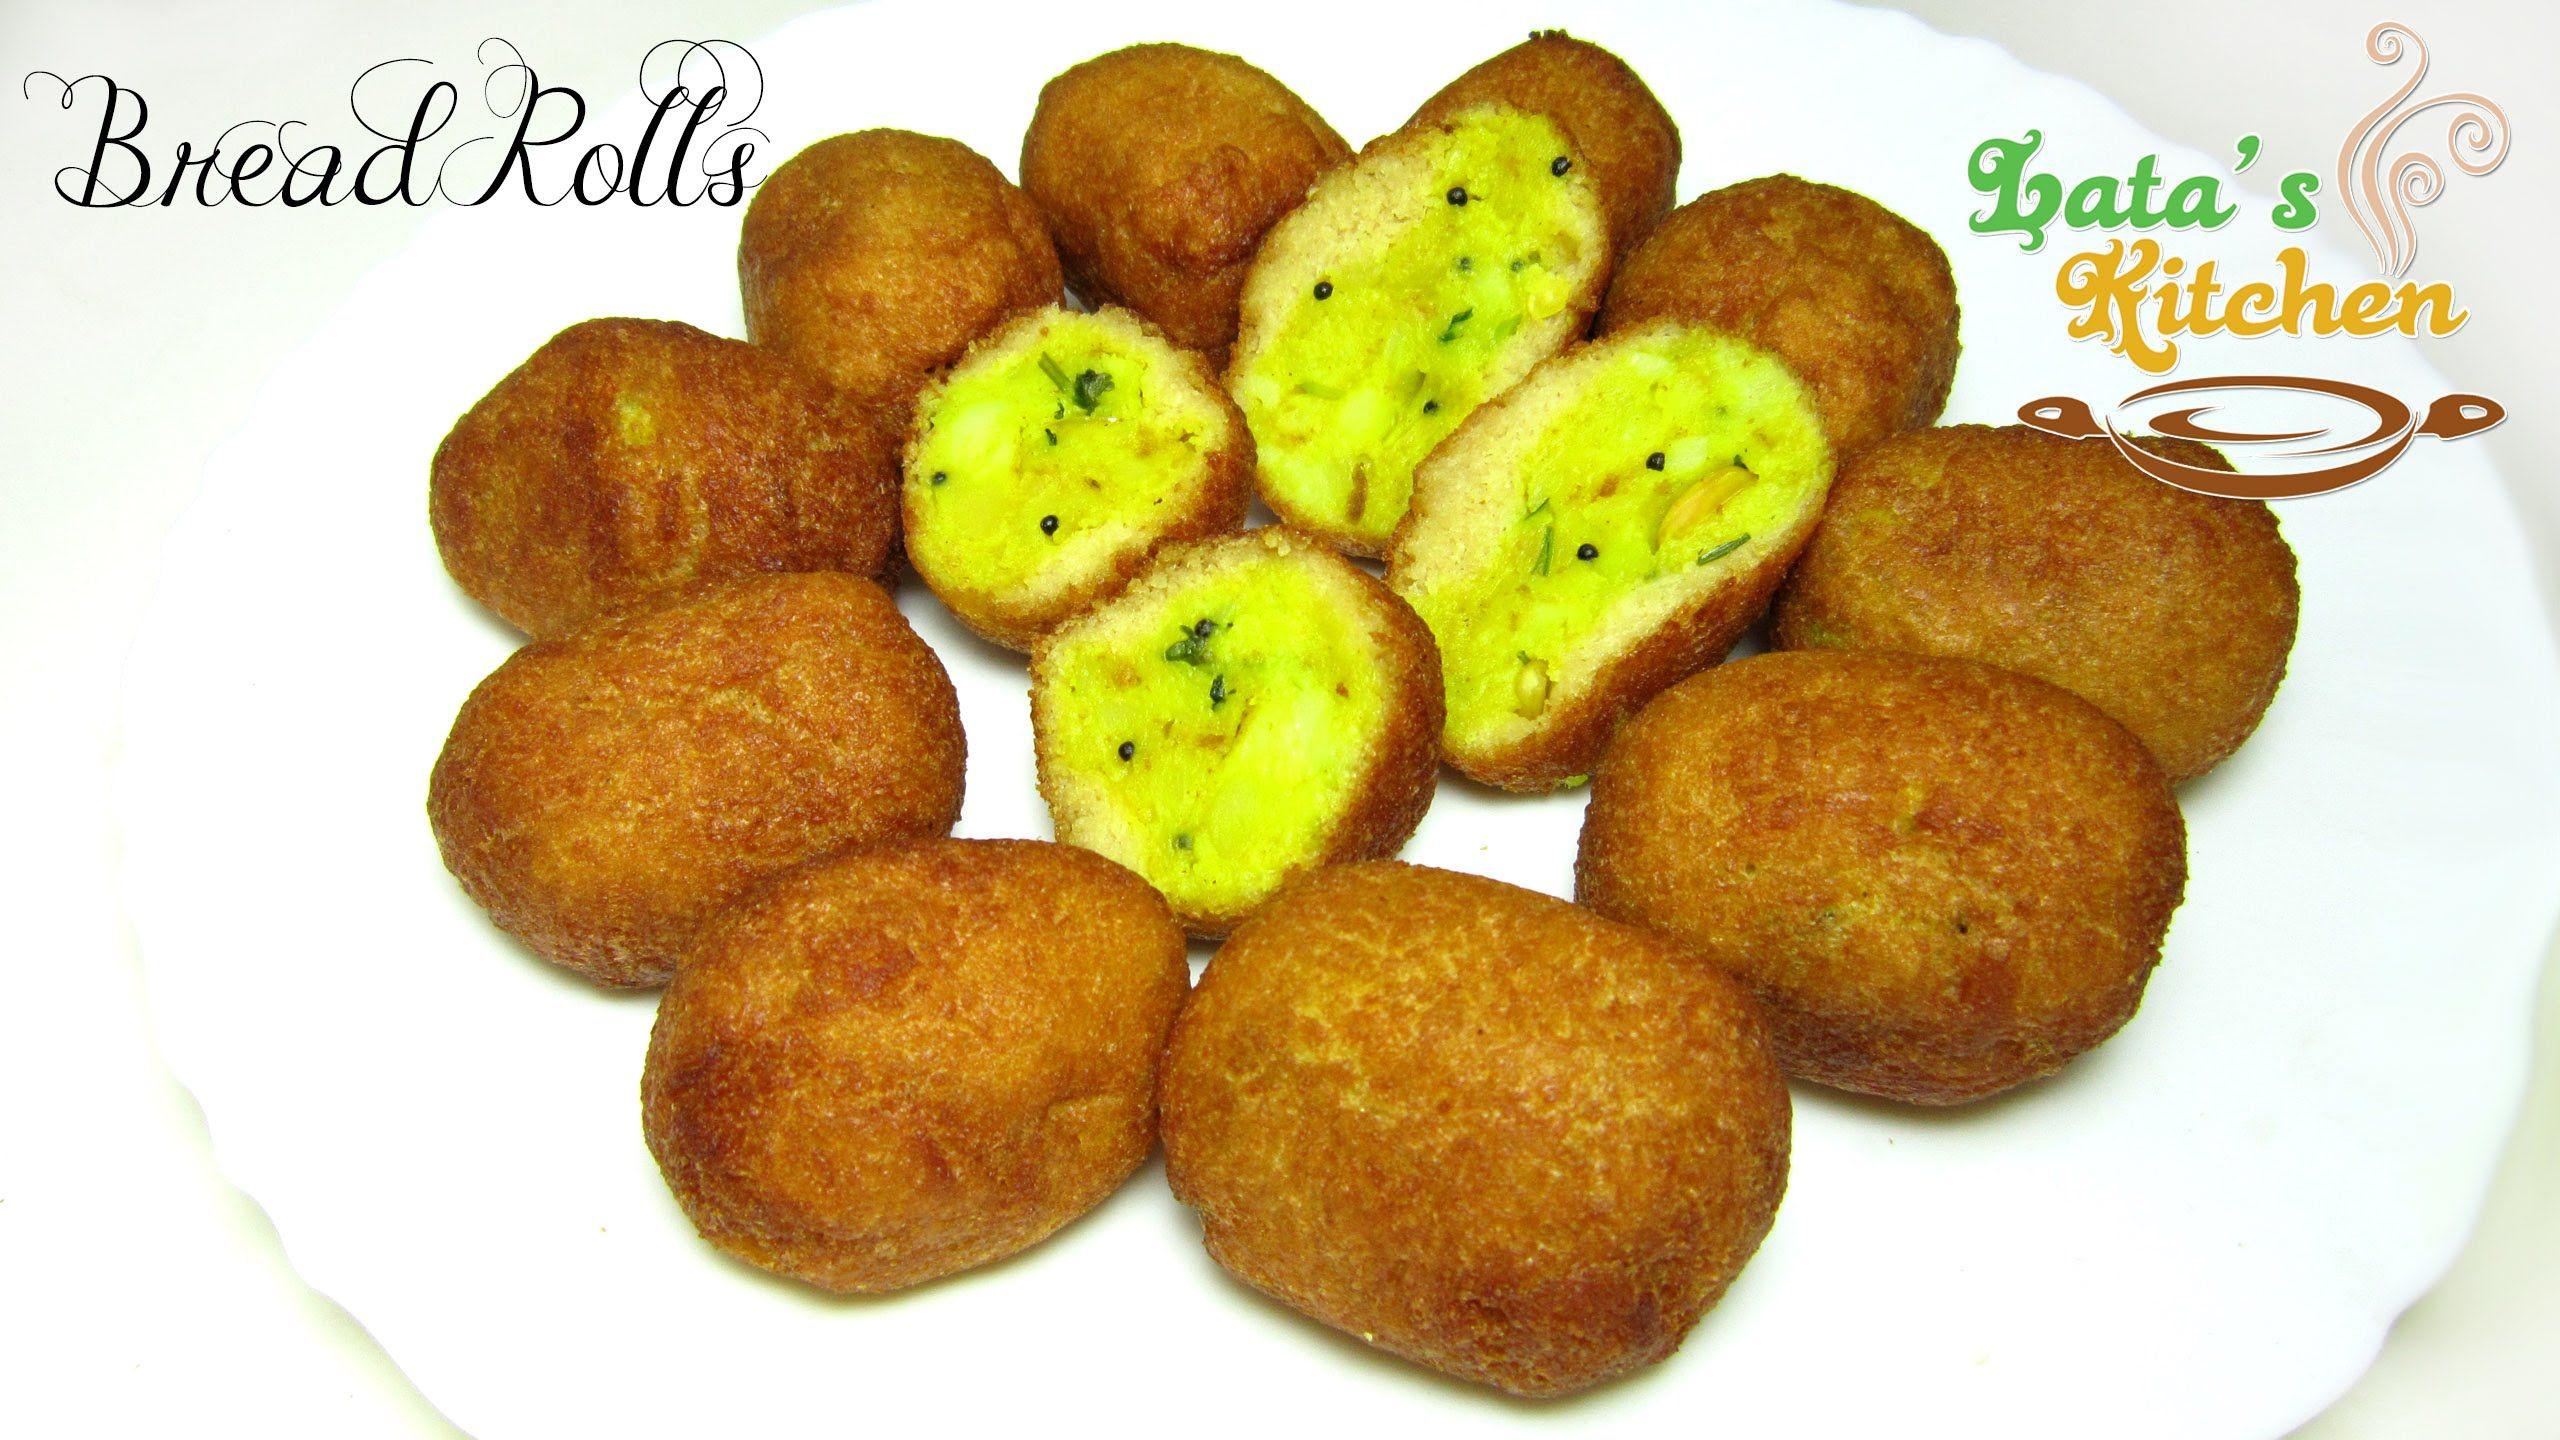 Bread potato rolls recipe indian vegetarian snack recipe video bread potato rolls recipe indian vegetarian snack recipe video in hindi with english subtitles forumfinder Image collections